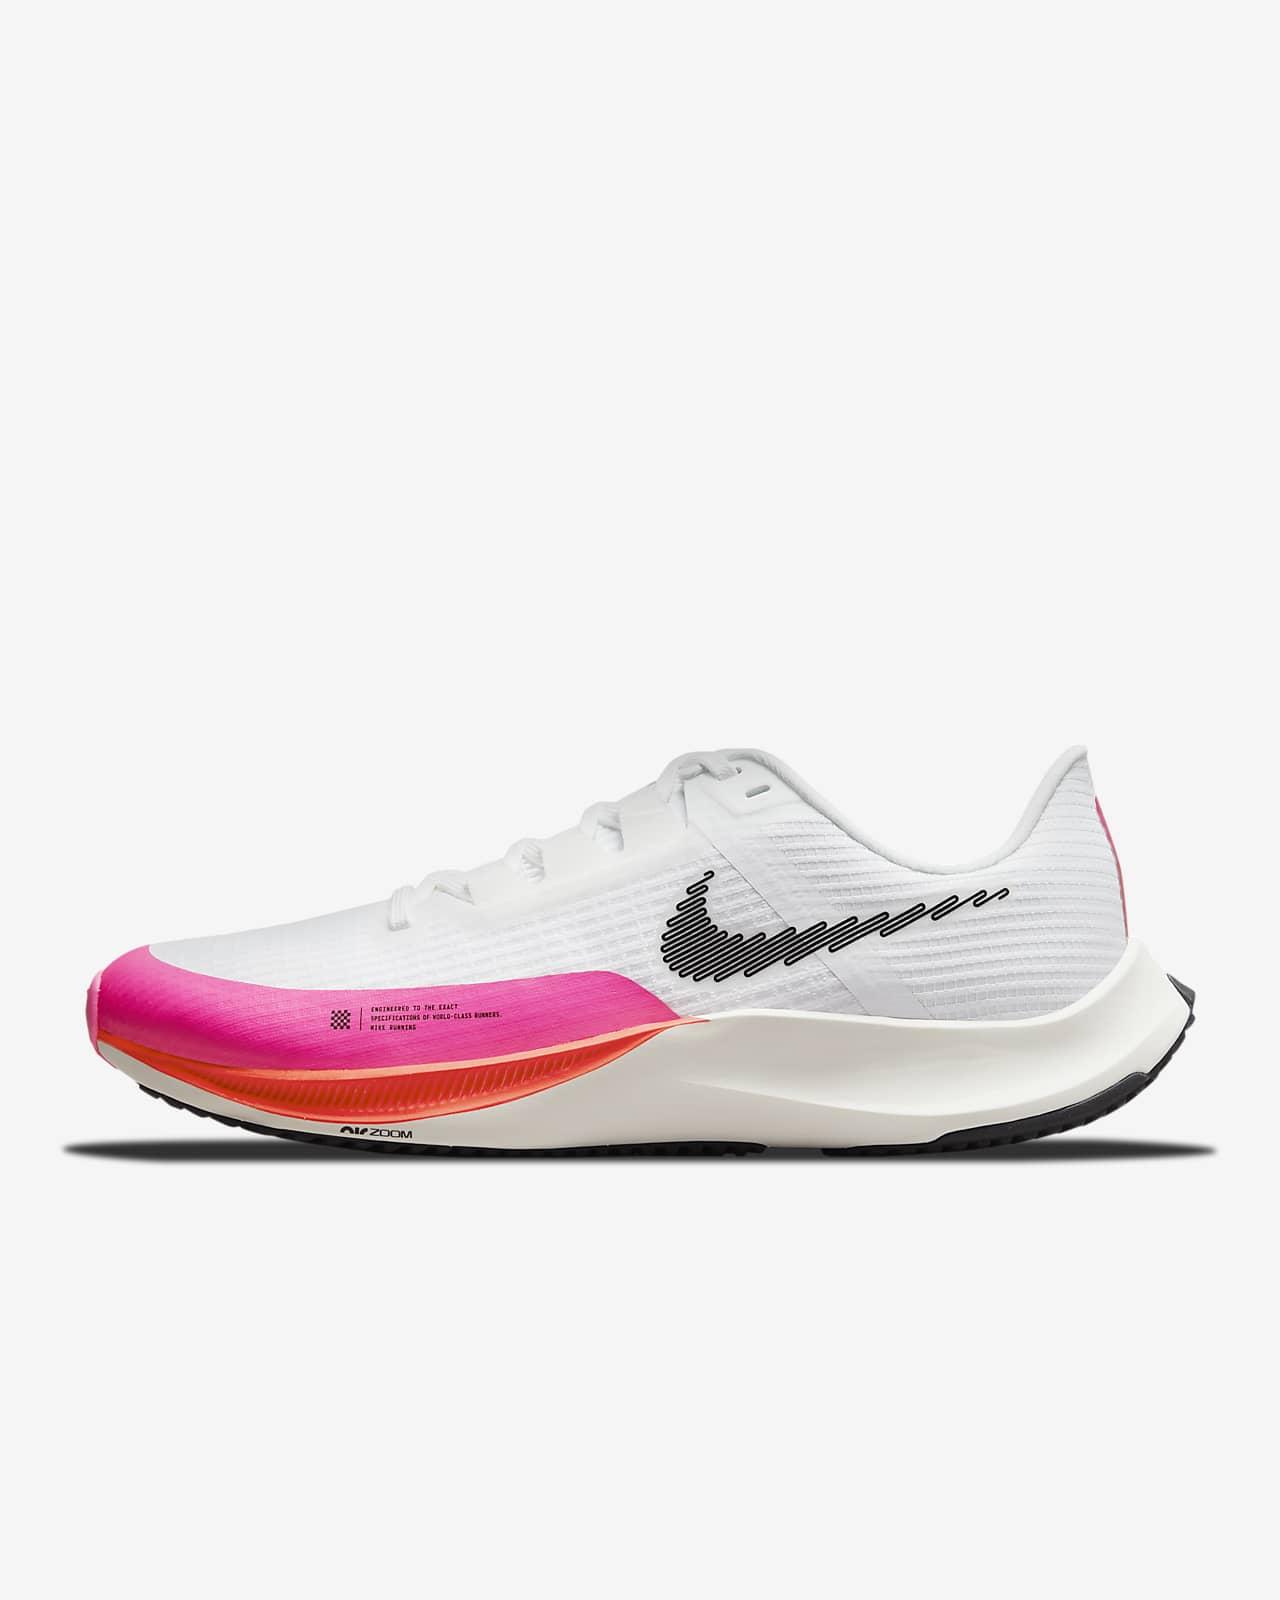 Nike Air Zoom Rival Fly 3 Men's Road Racing Shoe